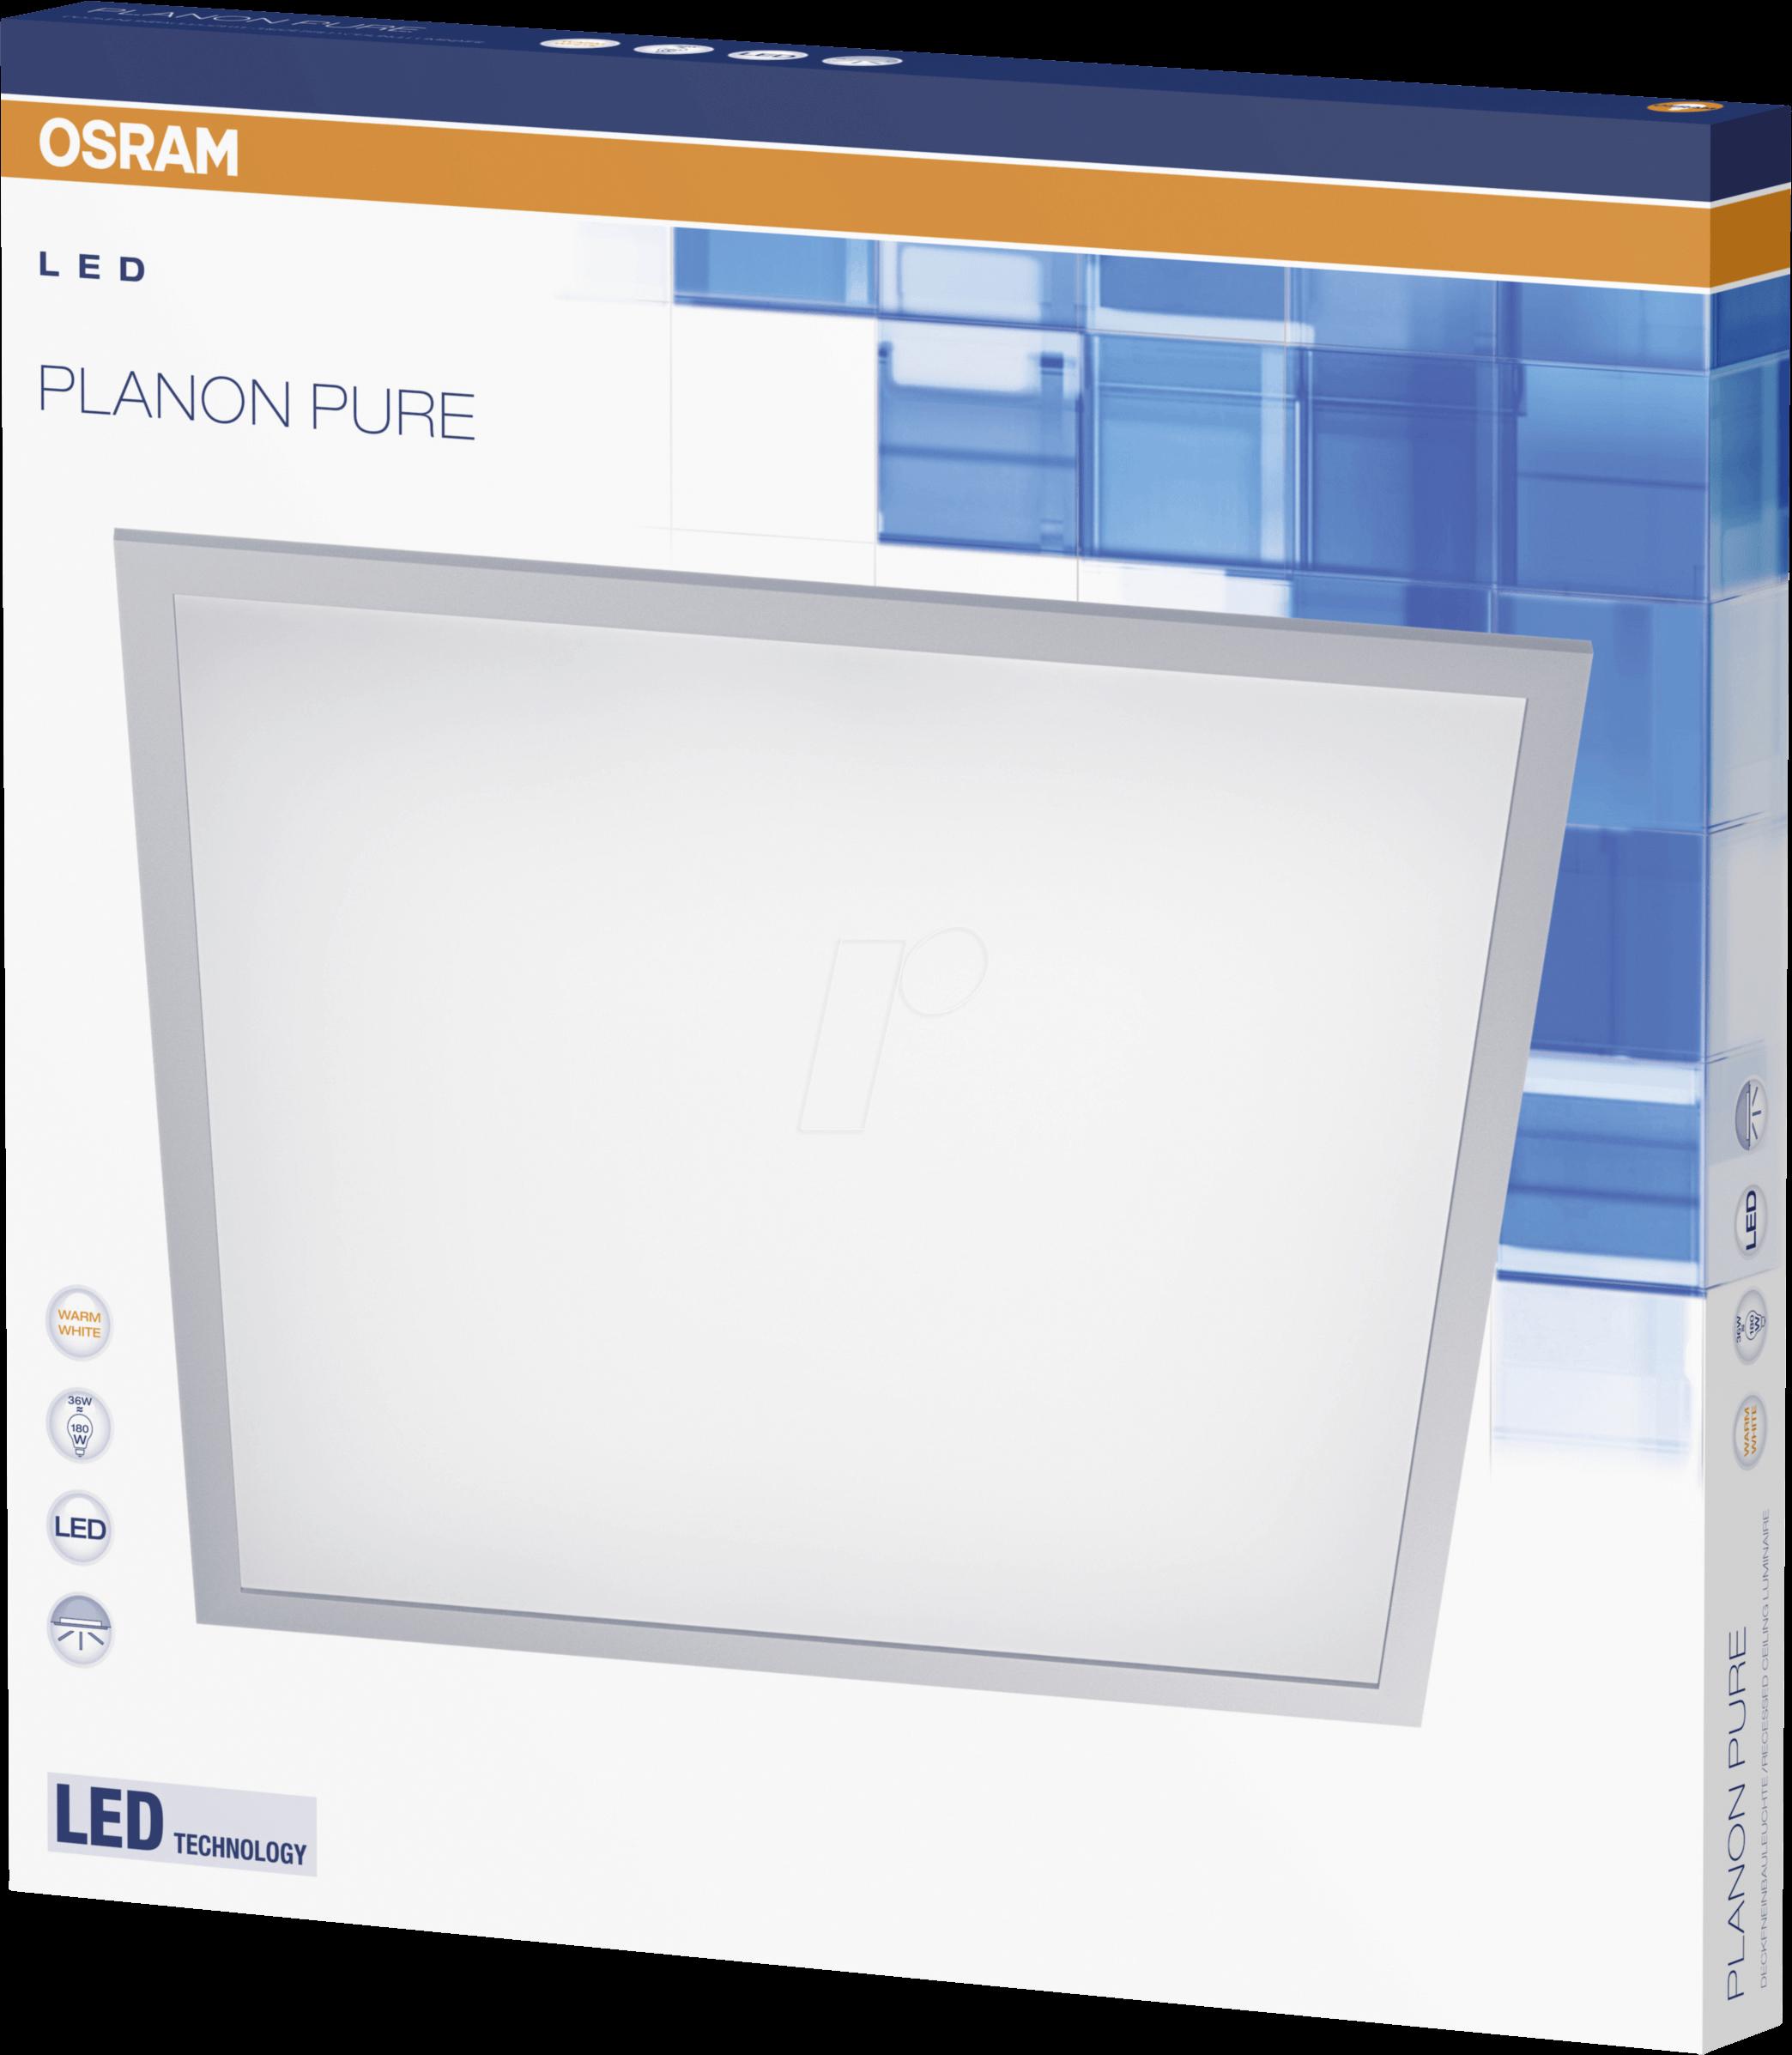 OSR 405807503534 - LED-Panel, PLANON PURE, 36 W, 3000 lm, 3000 K